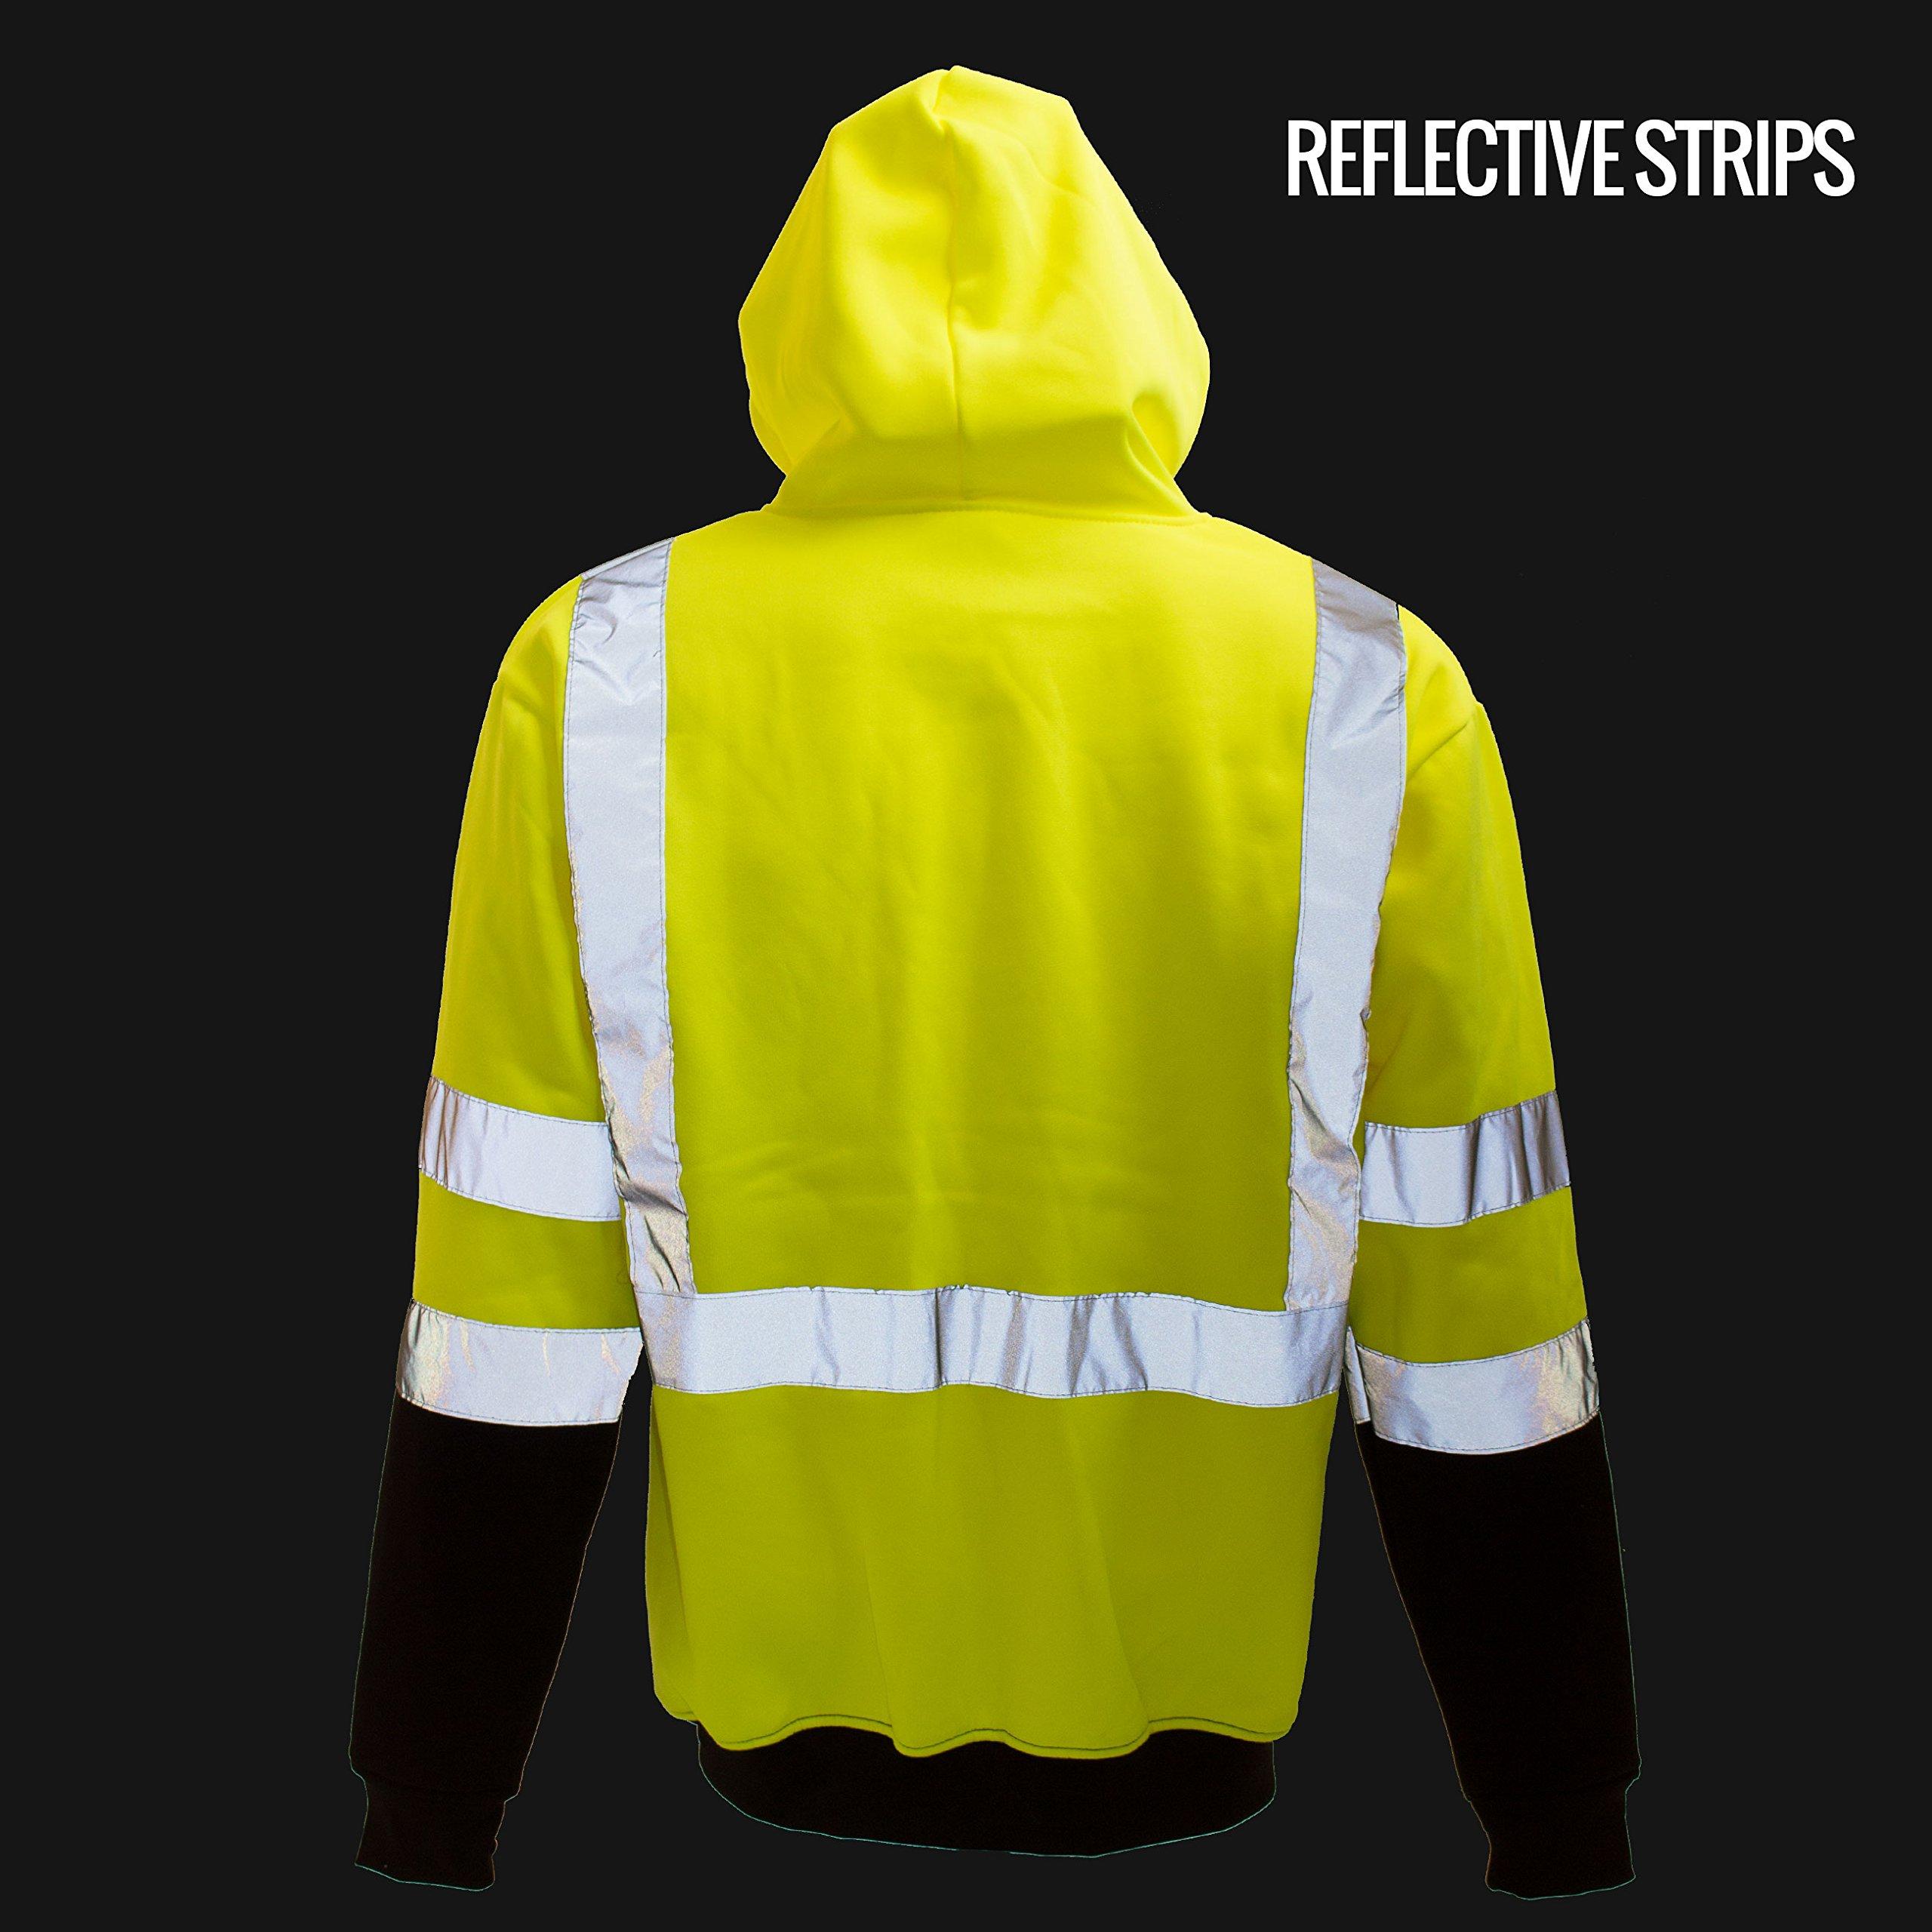 New York Hi-Viz Workwear H8312 Men's ANSI Class 3 High Visibility Class 3 Sweatshirt, Hooded Pullover, Knit Lining, Black Bottom (Lime, Large) by New York Hi-Viz Workwear (Image #5)